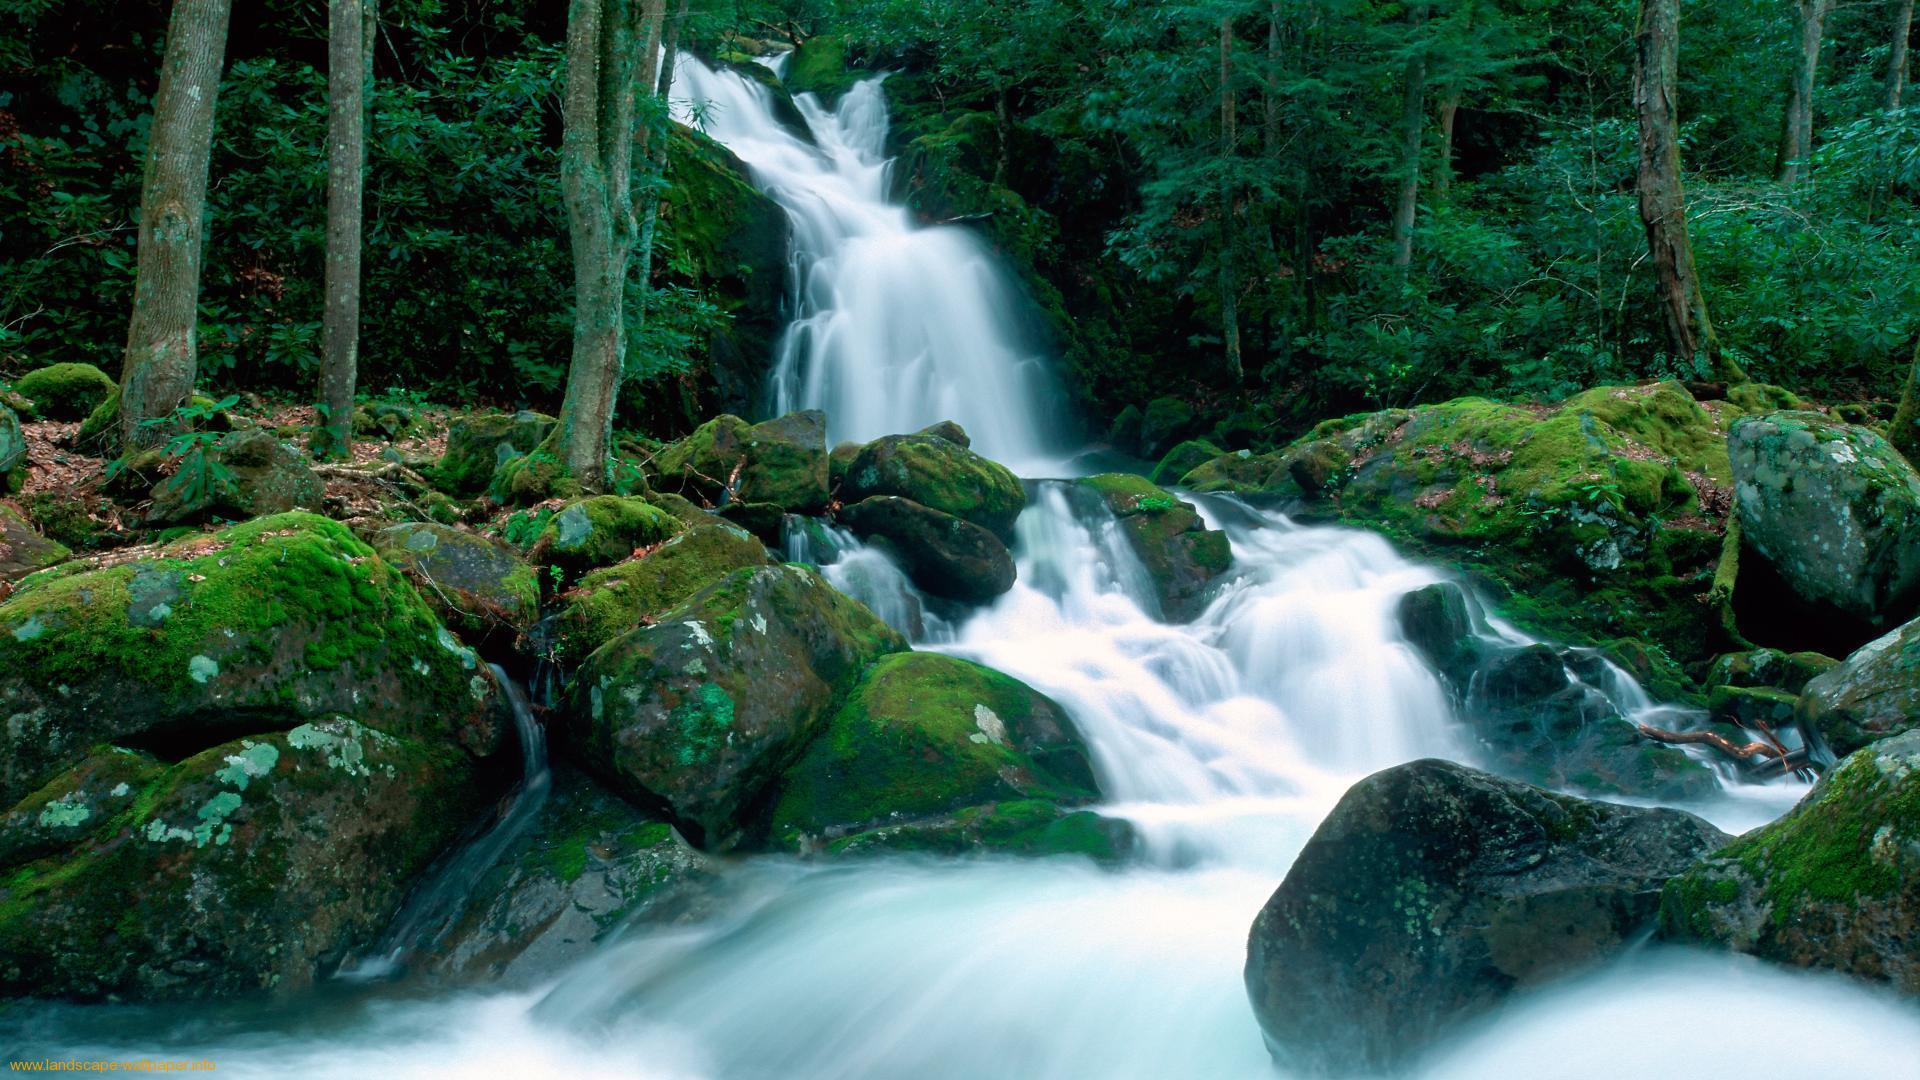 waterfalls wallpapers most beautiful - photo #41